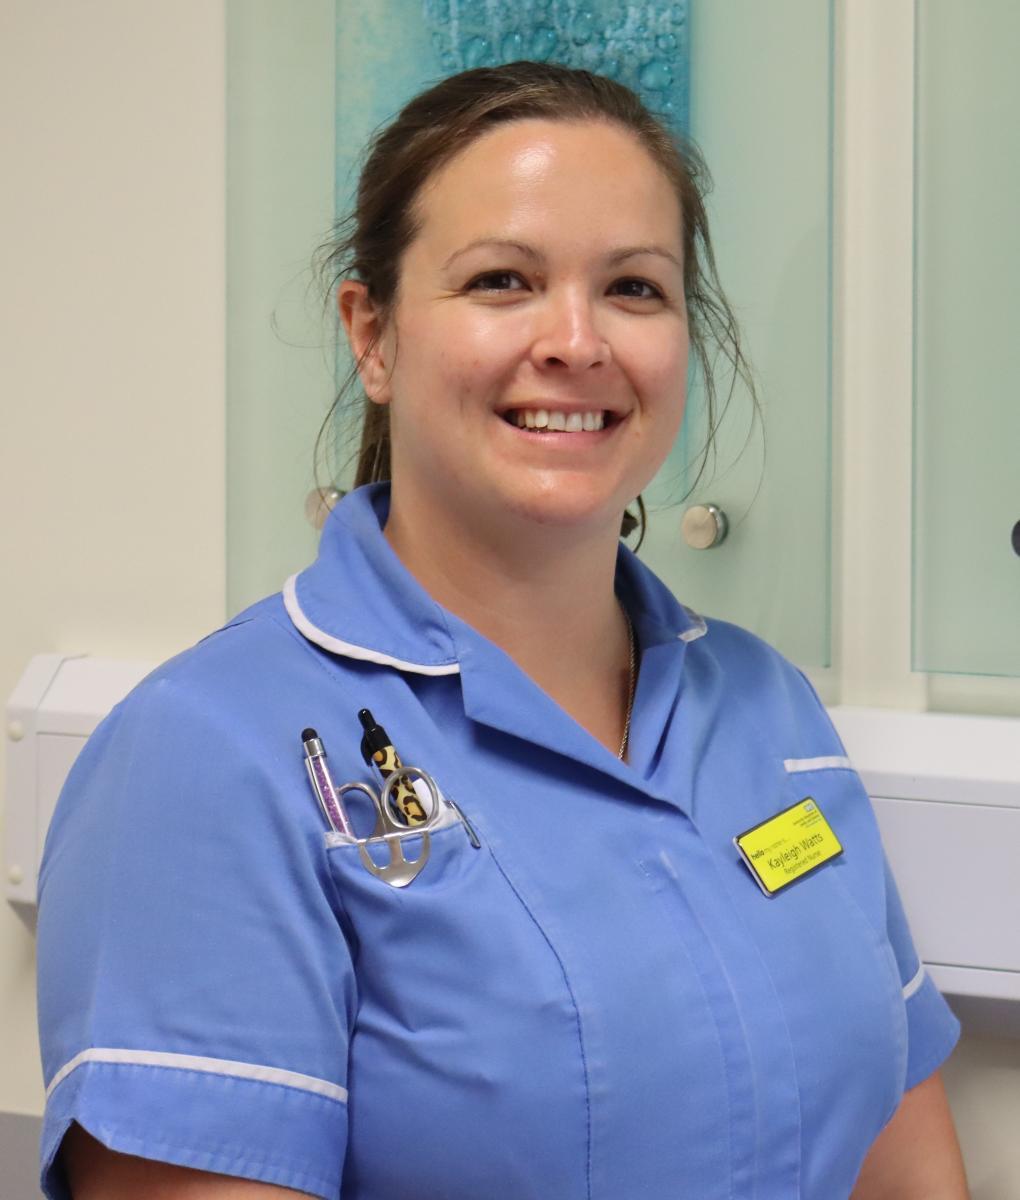 image-RN Nurse.JPG